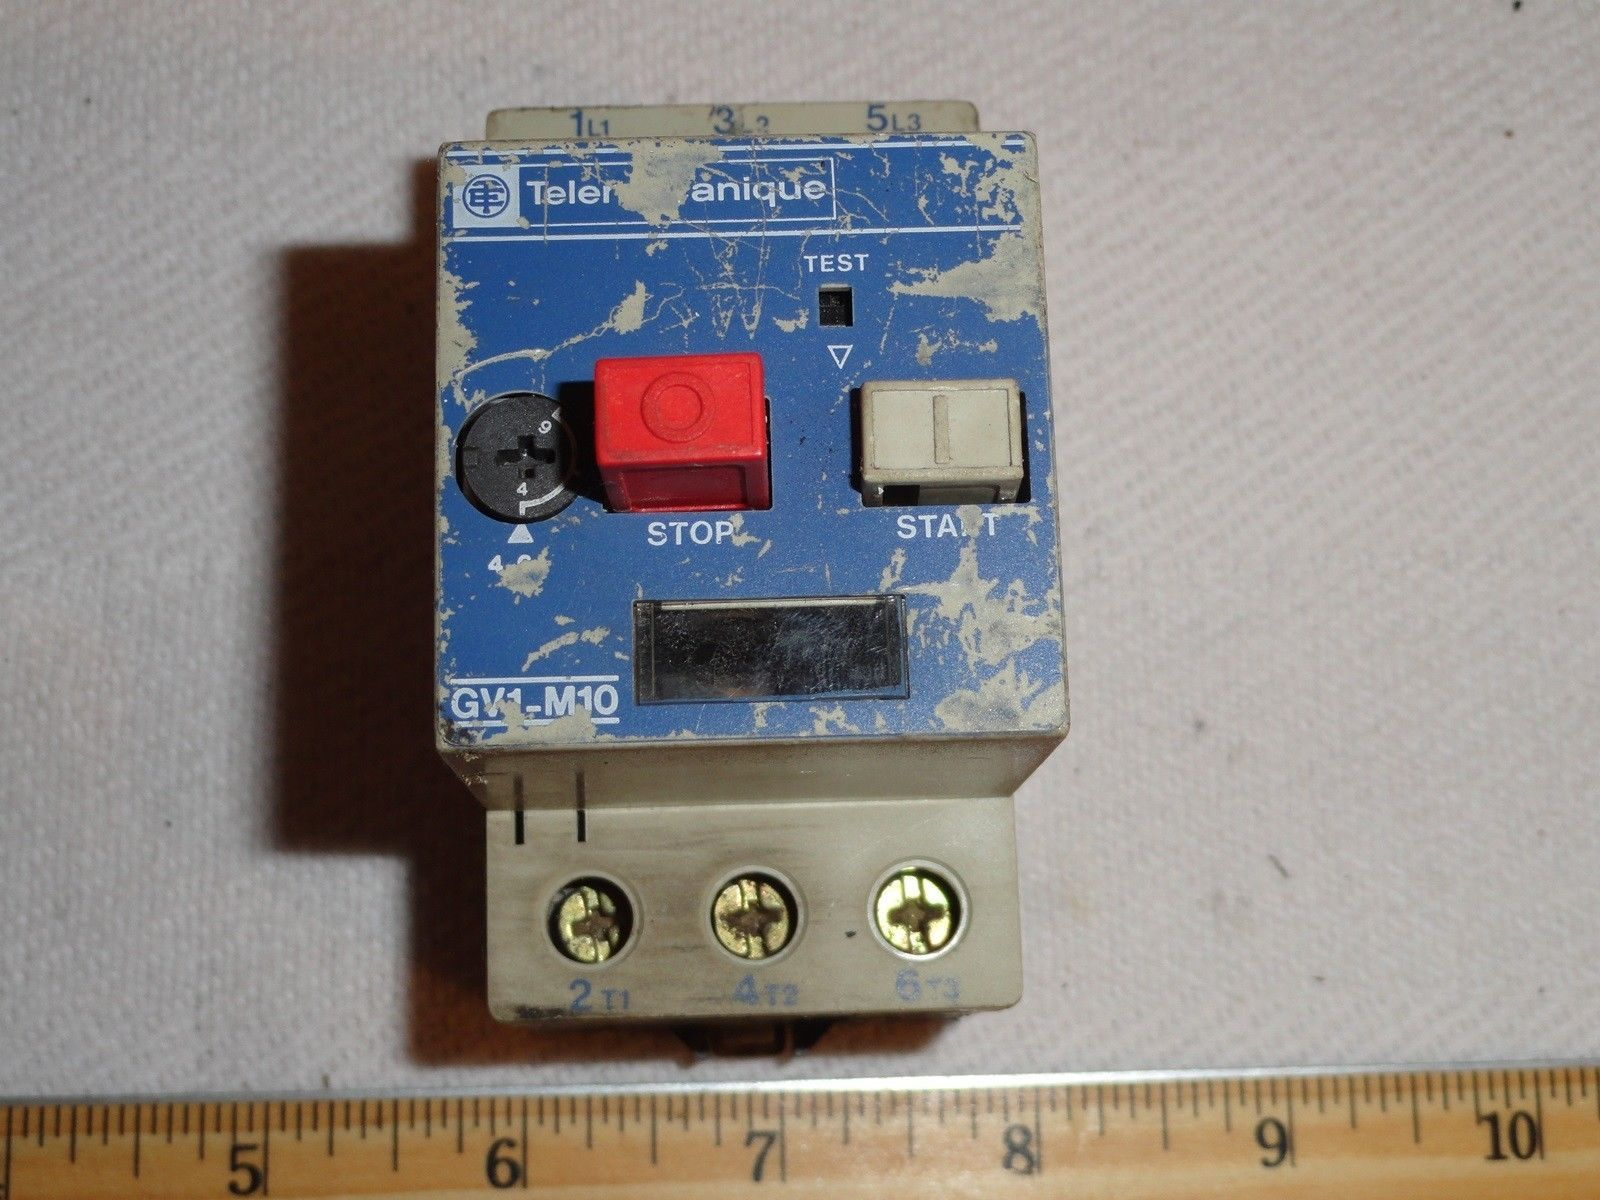 Telemecanique Gv1 M10 Motor Starter Circuit And 50 Similar Items Details About Siemens 5sx21 C5 230 400v 5 Amp Breaker T2ec16jhjhsfgljioo Ebrwcp0lr 60 57